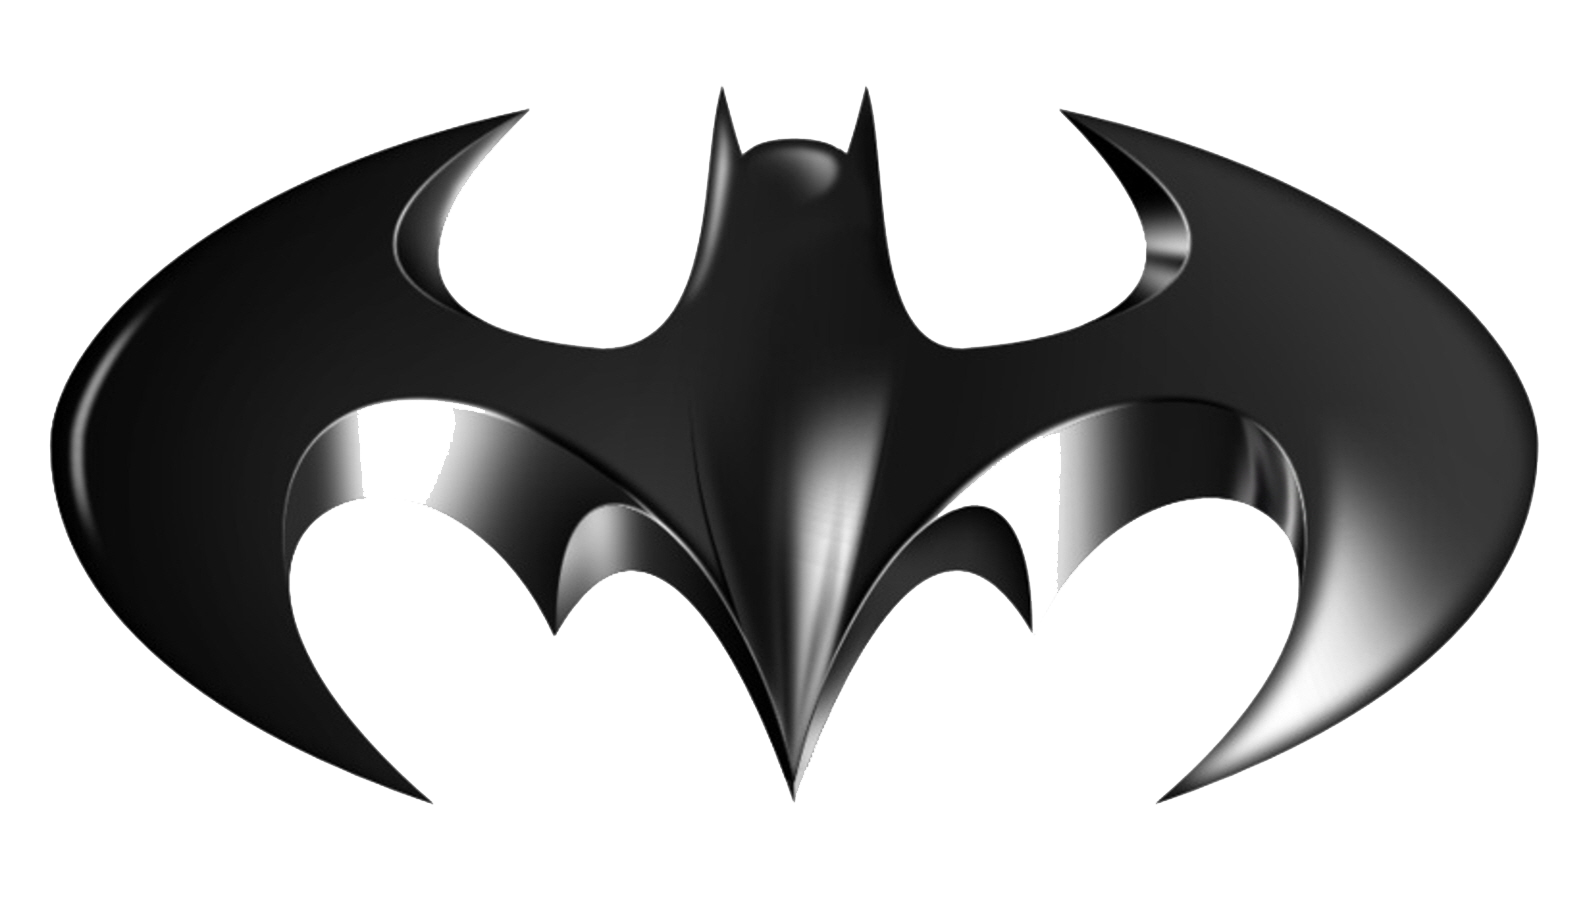 batman logo png image purepng free transparent cc0 png image library